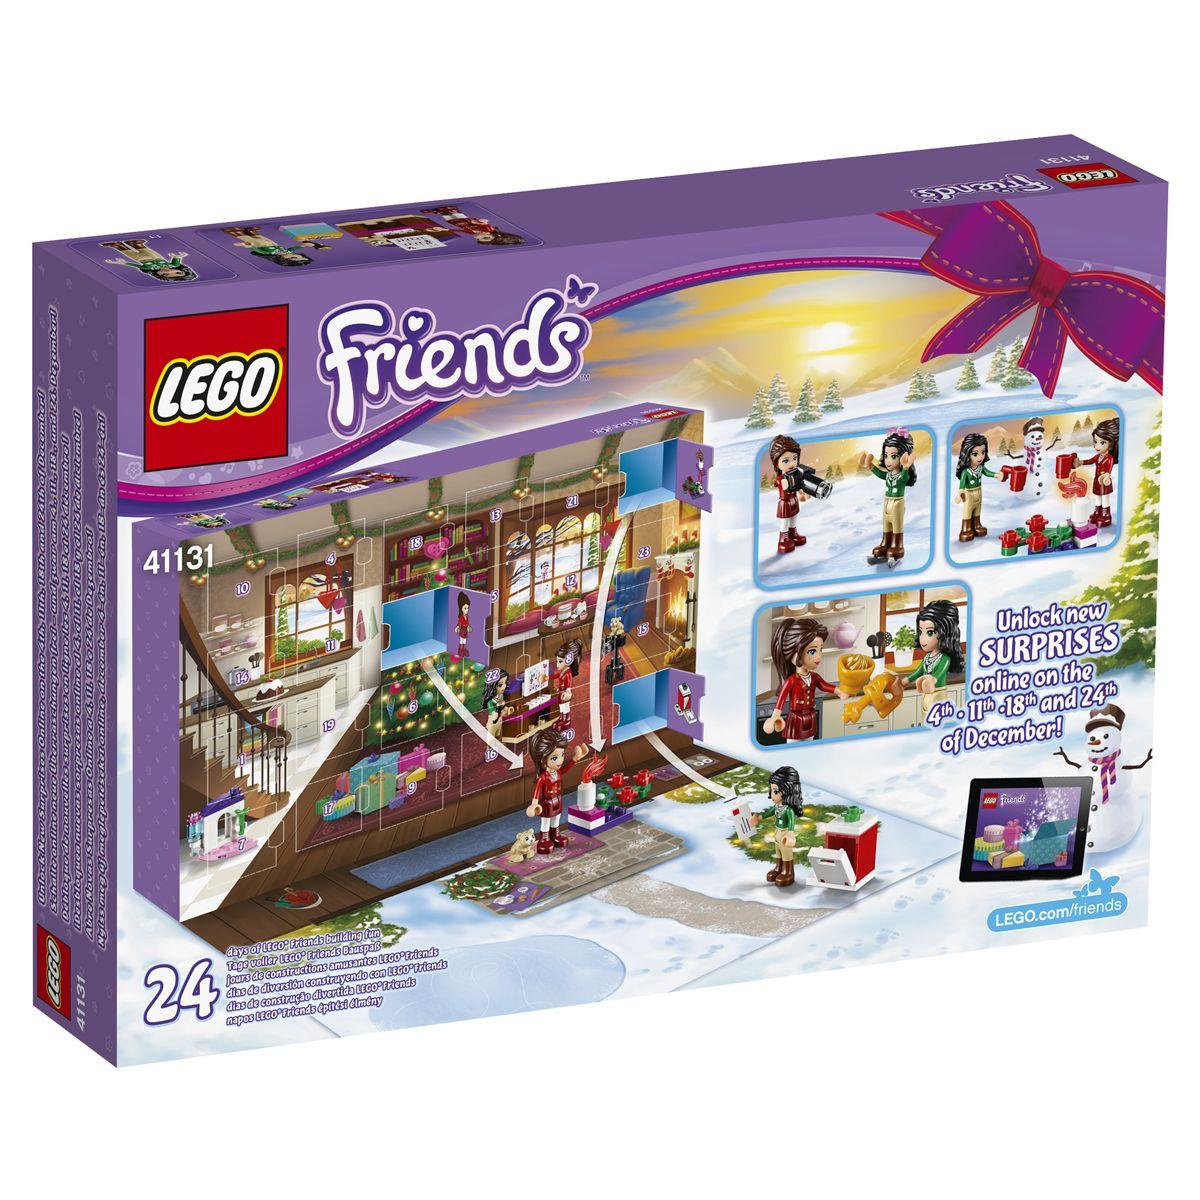 Lego Friends Calendrier De L Avent.Lego Friends 41131 Calendrier De L Avent Ville Et